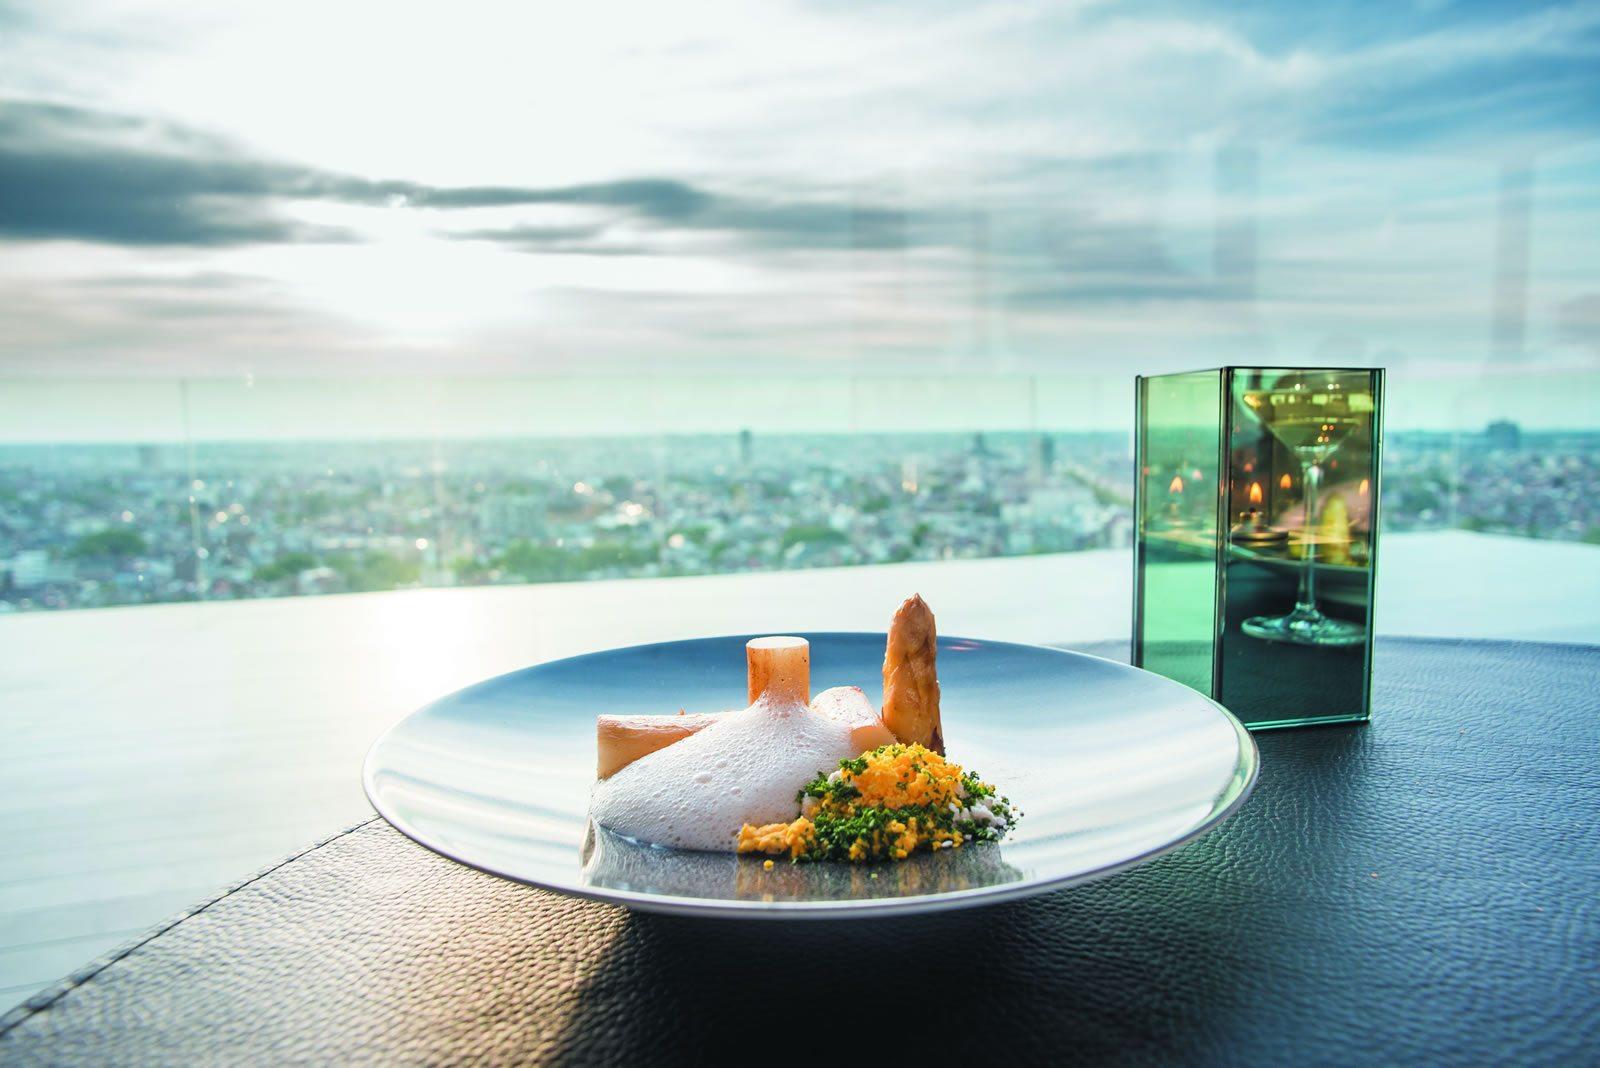 adresses-gourmandes-restaurants-villa-lorraine-villa-in-the-sky-chez-odette